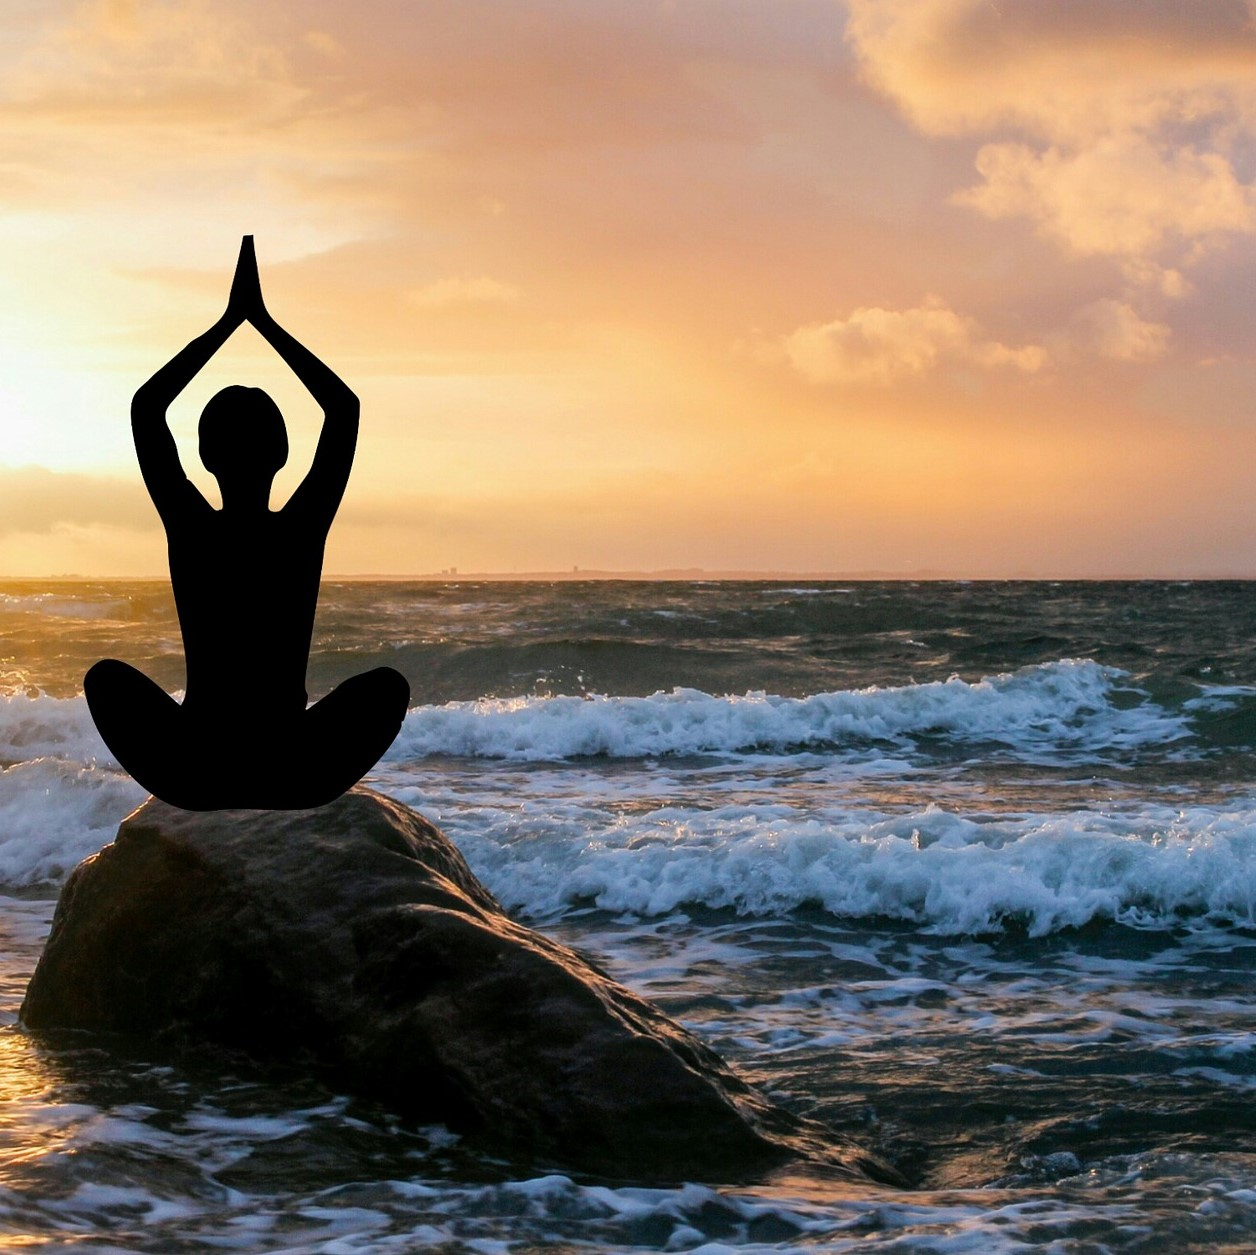 https://www.hladinaalfa.cz/wp-content/uploads/2019/11/meditation_s.jpg